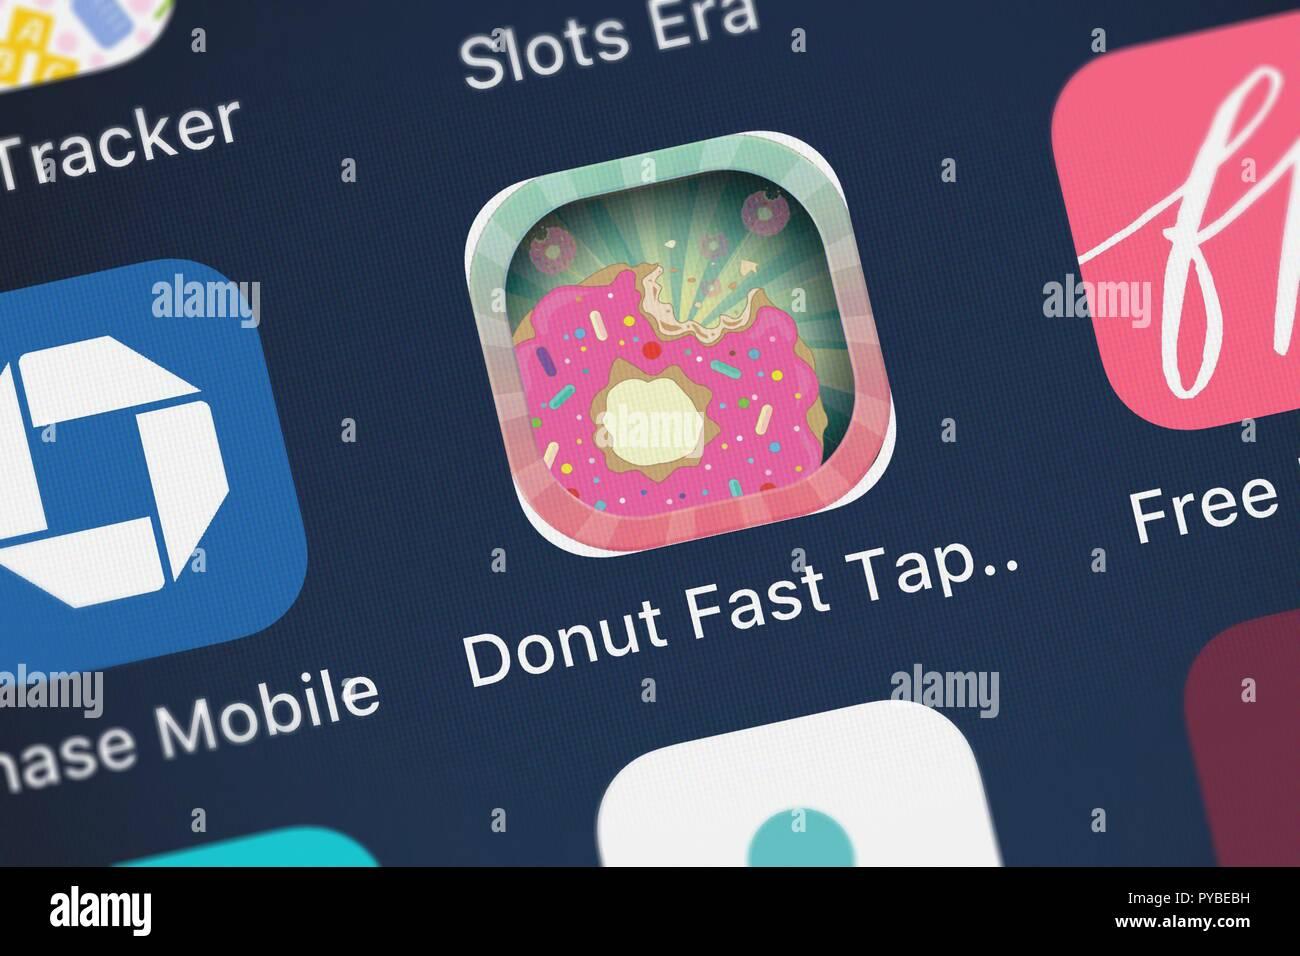 Donut Fast Tap Clicker Stock Photos & Donut Fast Tap Clicker